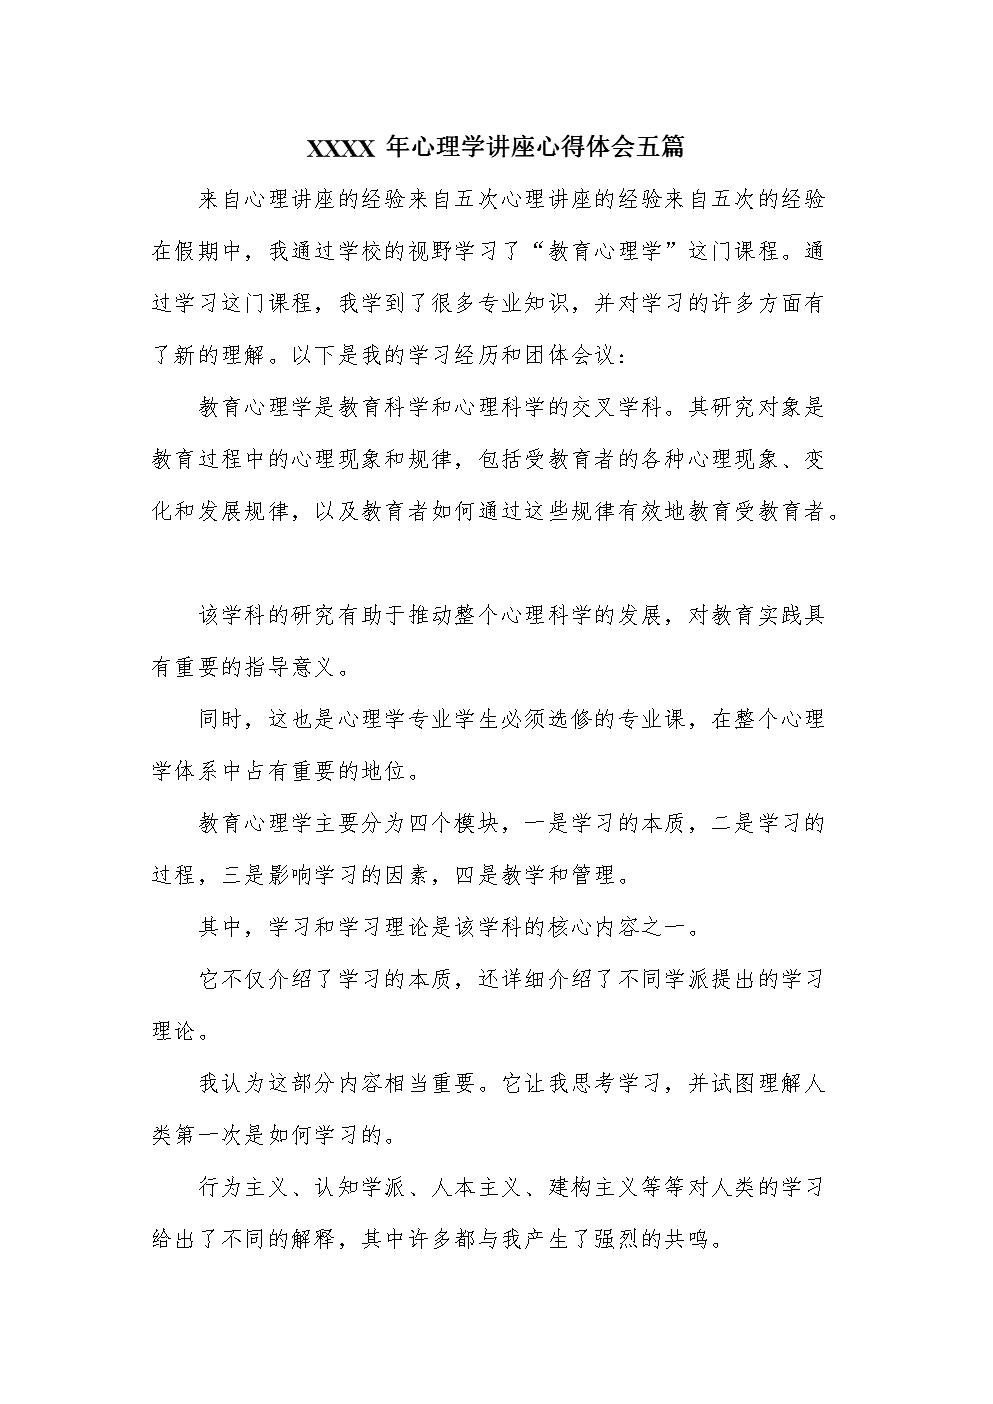 XX年心理学讲座心得体会五篇.doc